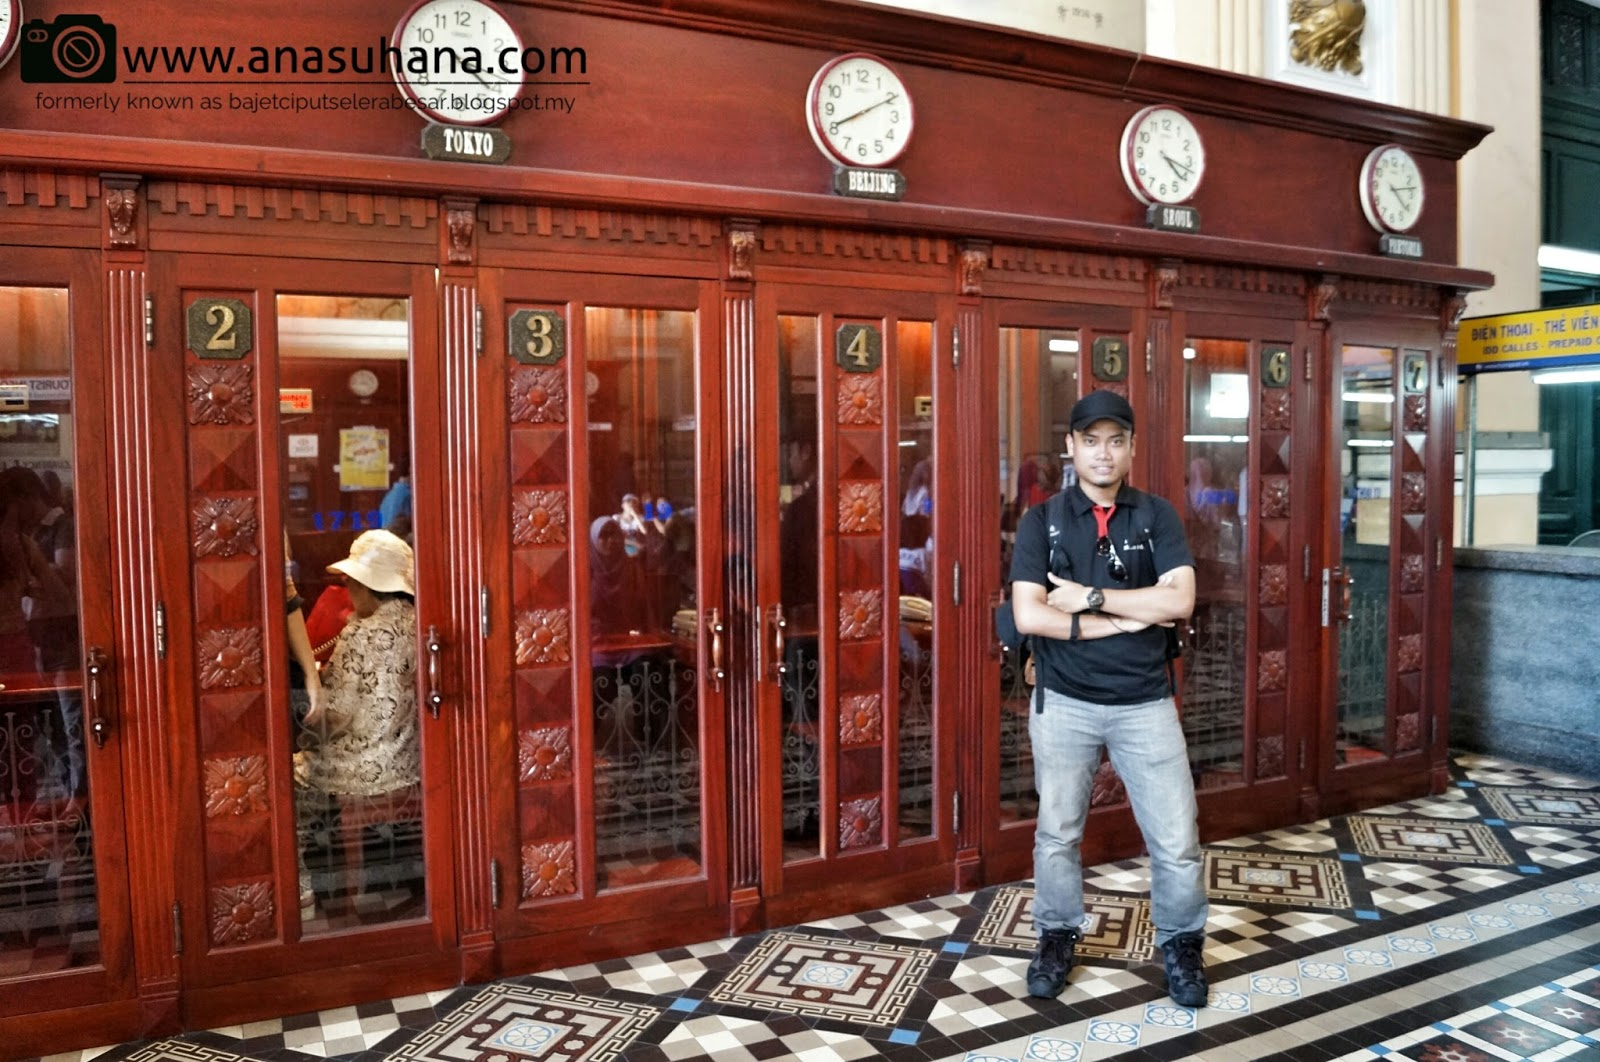 Pejabat Pos Pusat Saigon (Saigon Central Post Office)